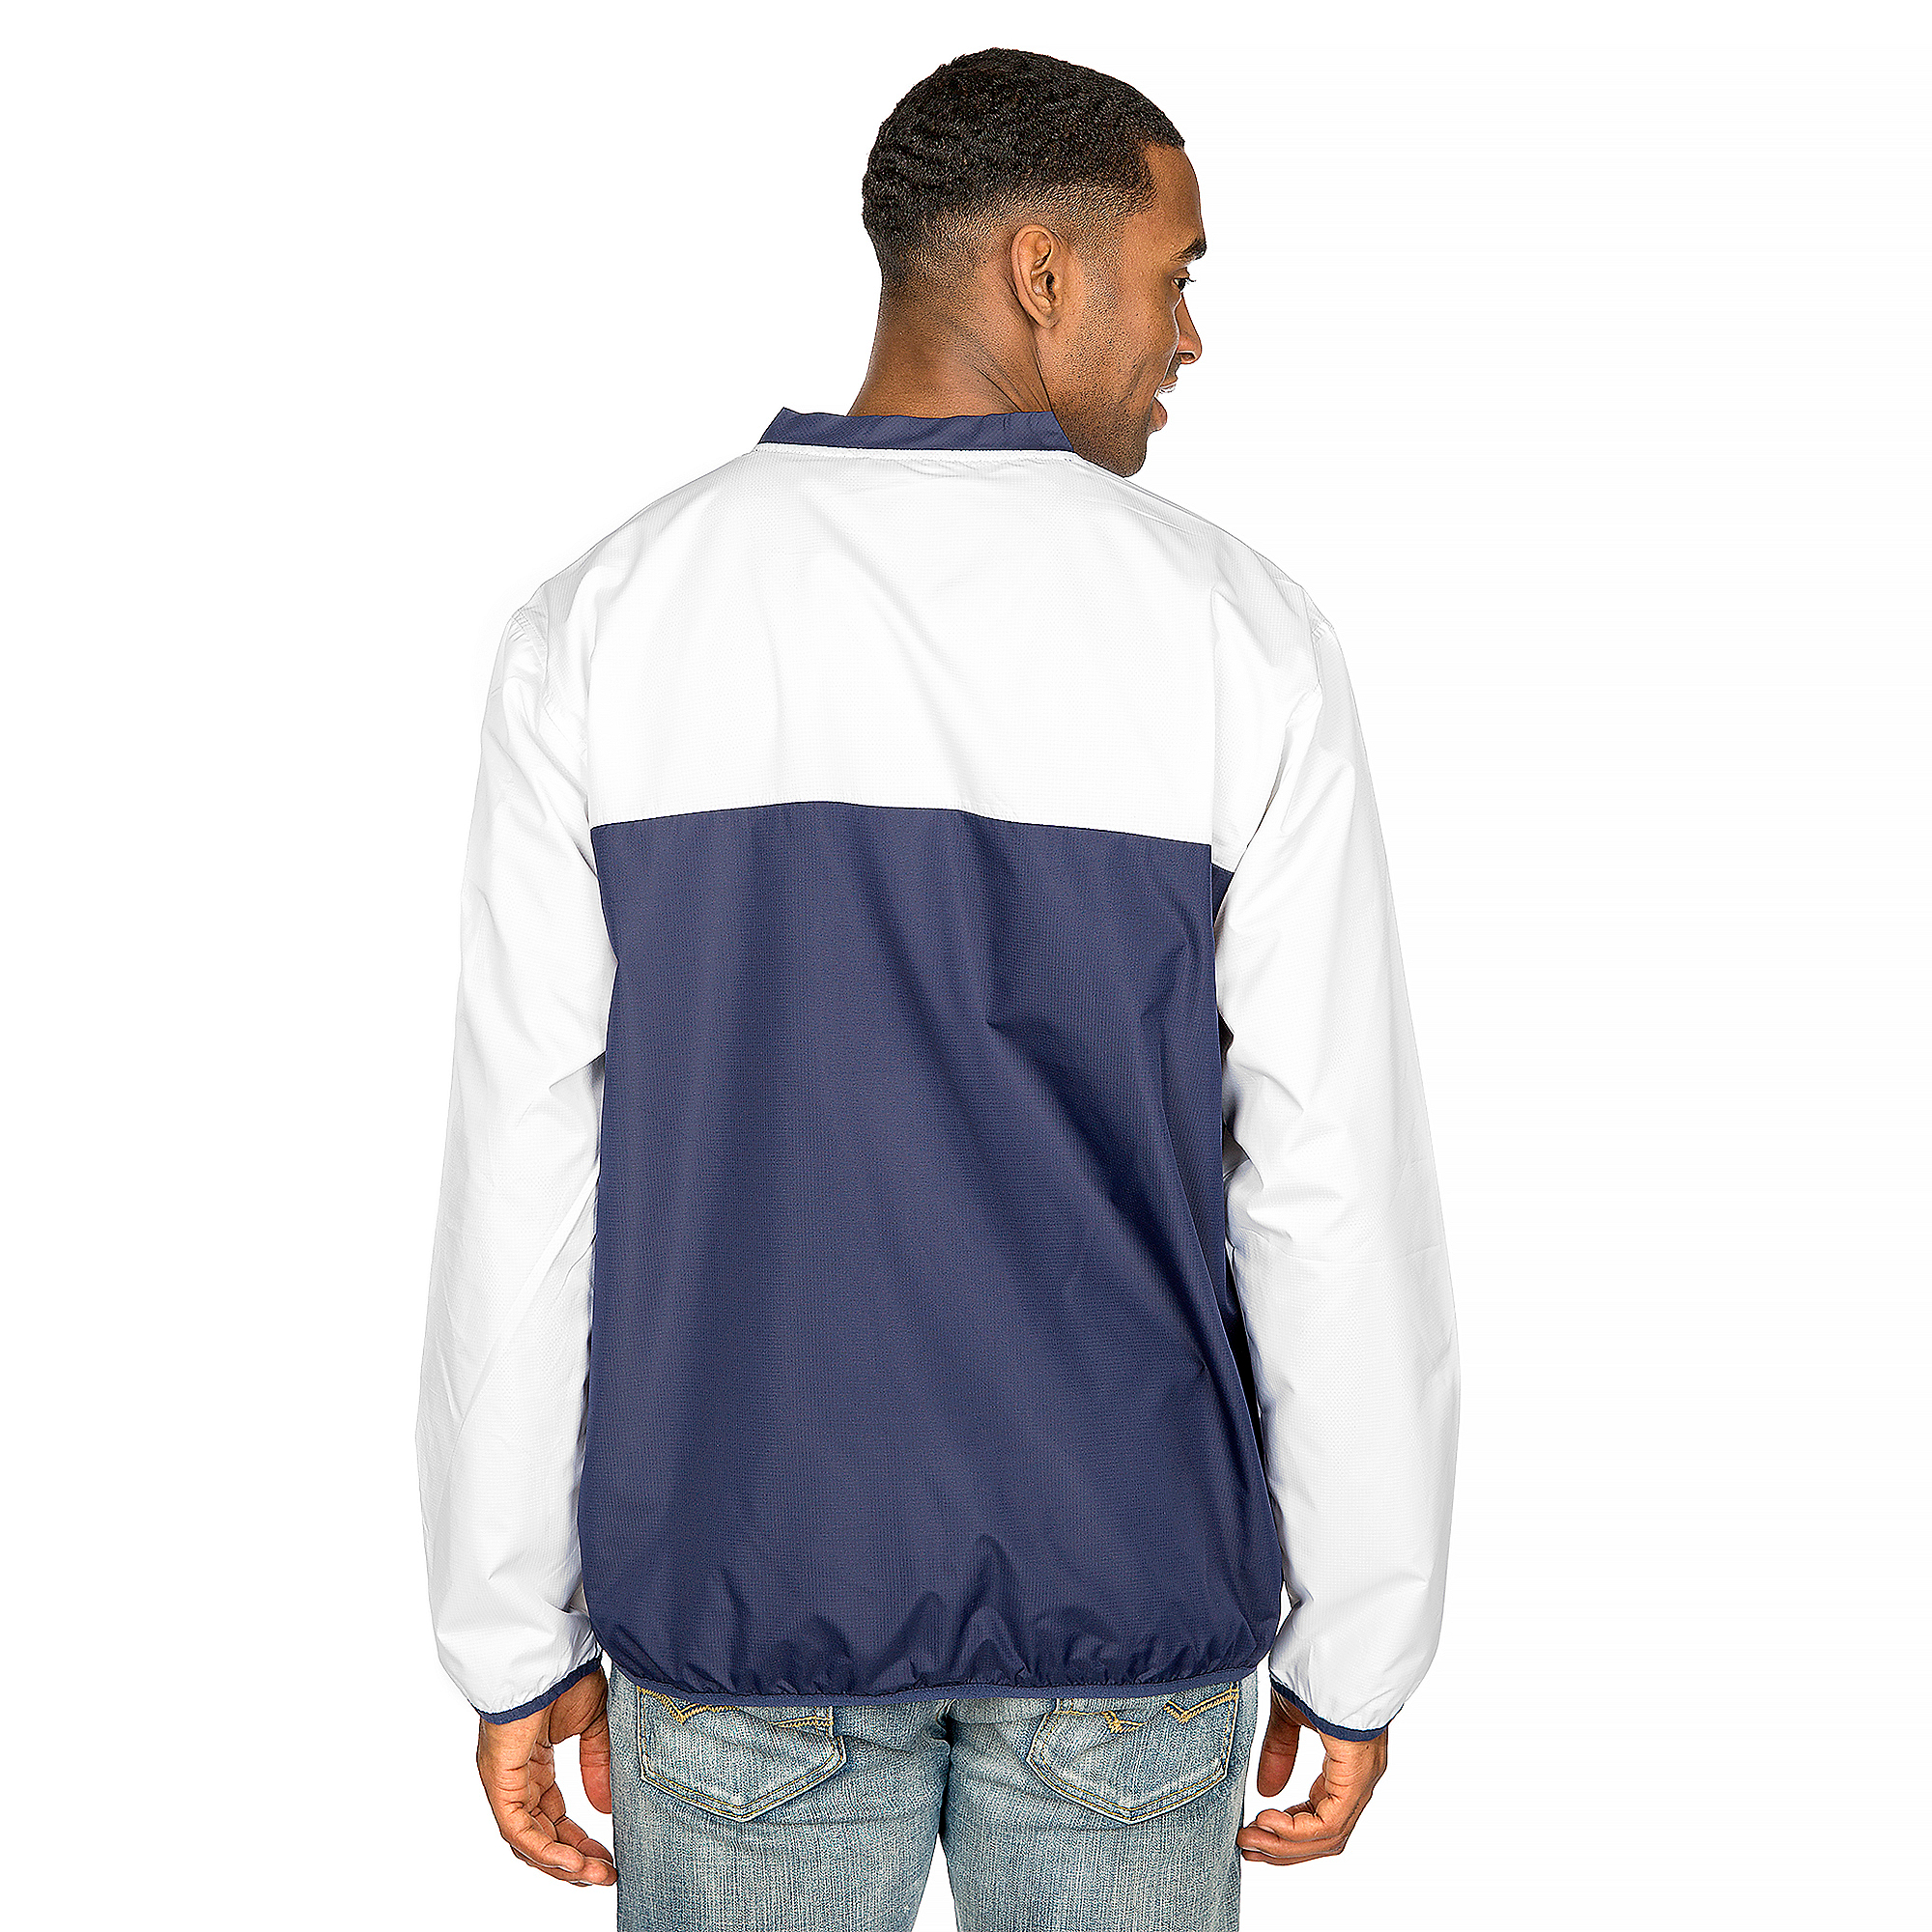 timeless design 4b215 72c7a Dallas Cowboys Elm Pullover Jacket   Dallas Cowboys Pro Shop